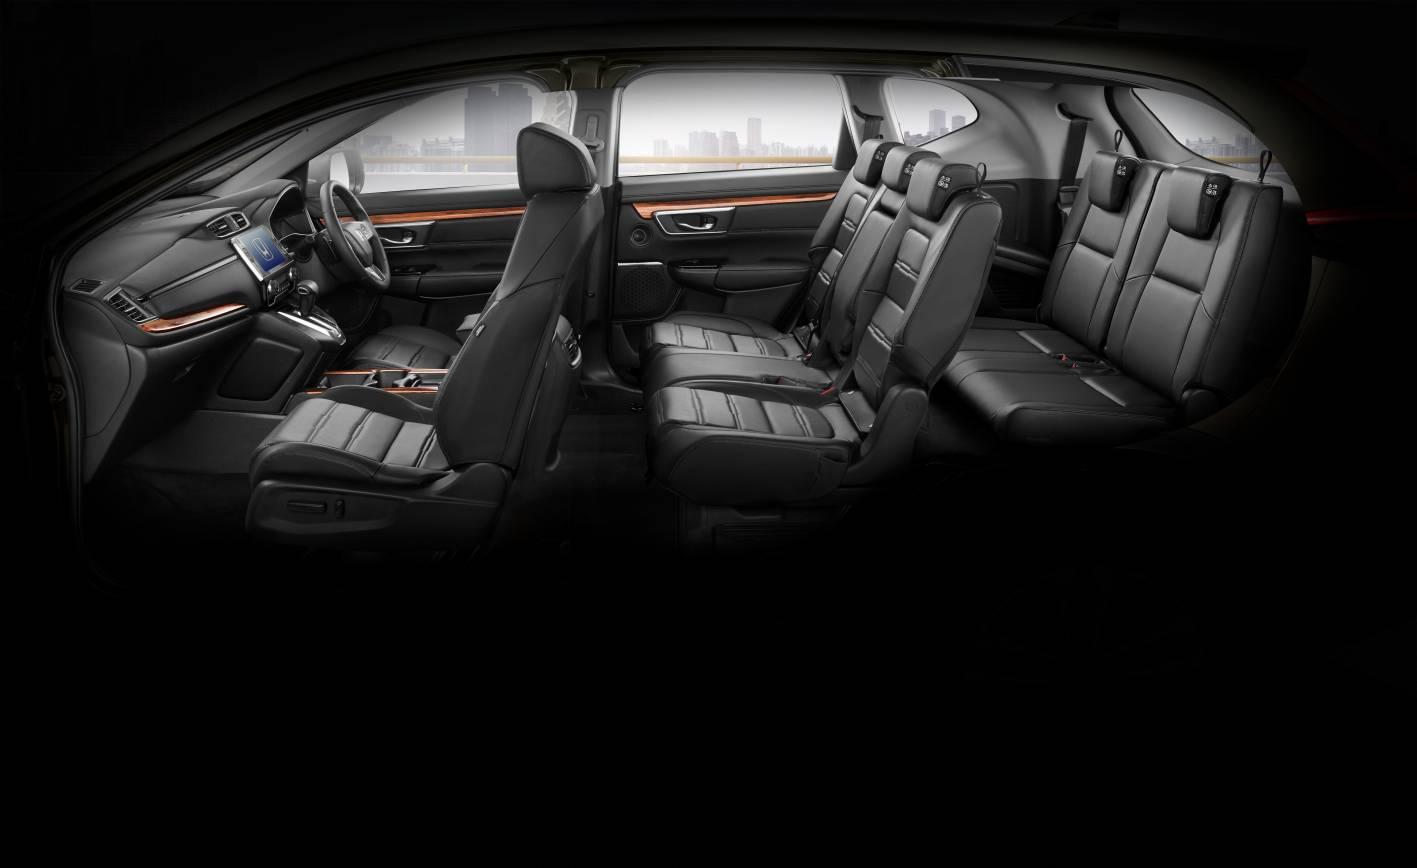 Honda Crv 7 Seater >> All turbo line-up and 7-seats for 2018 Honda CR-V ...